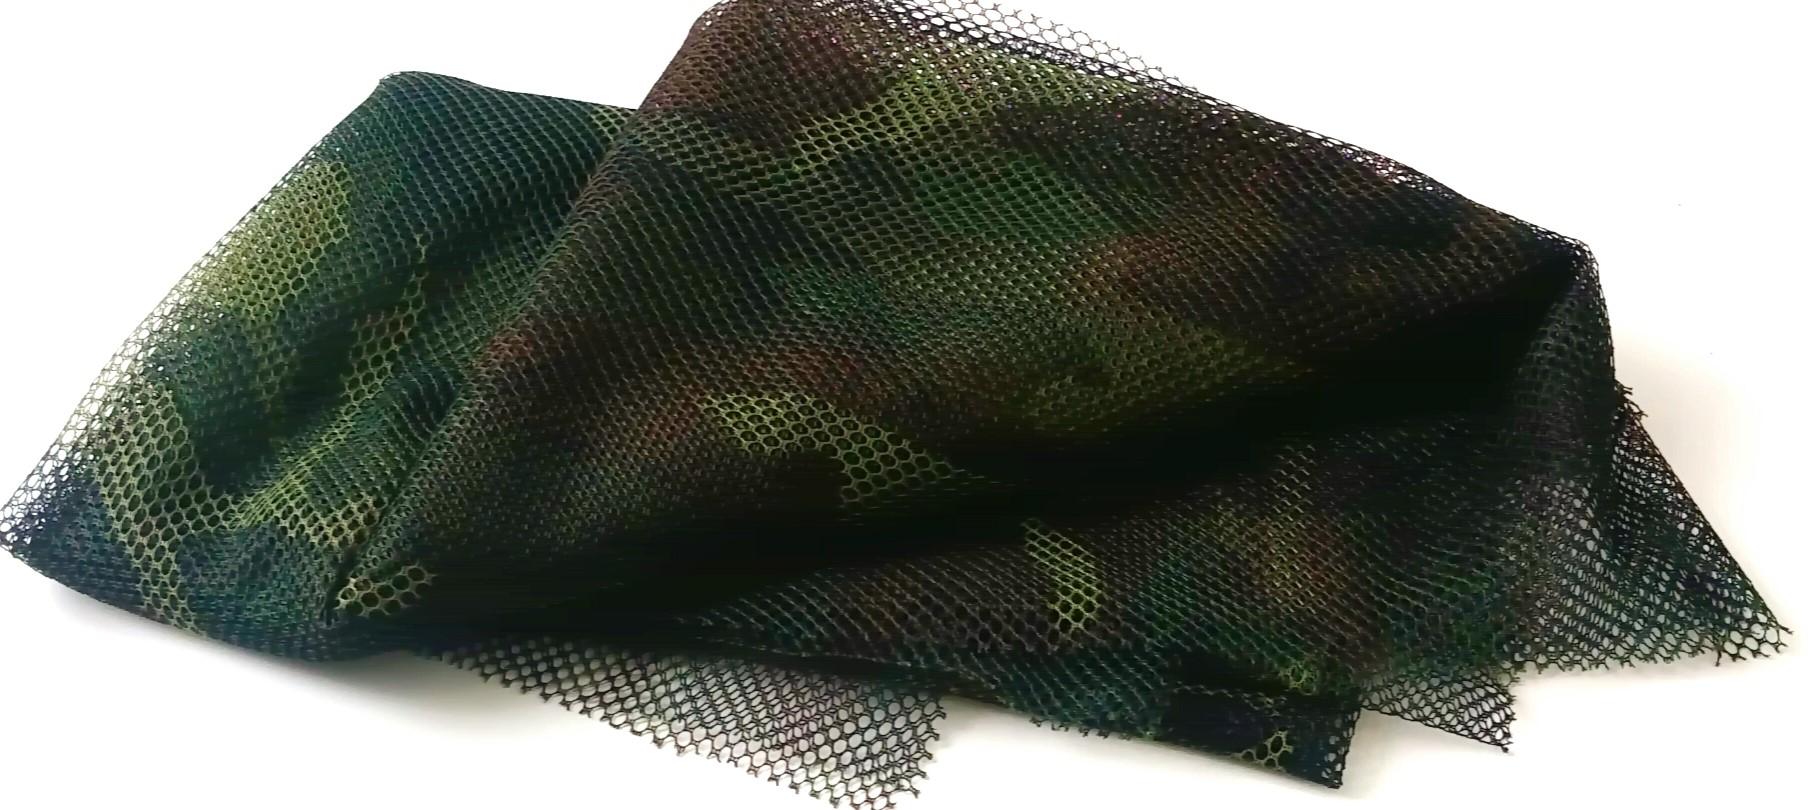 U.S. sniper camouflage netting